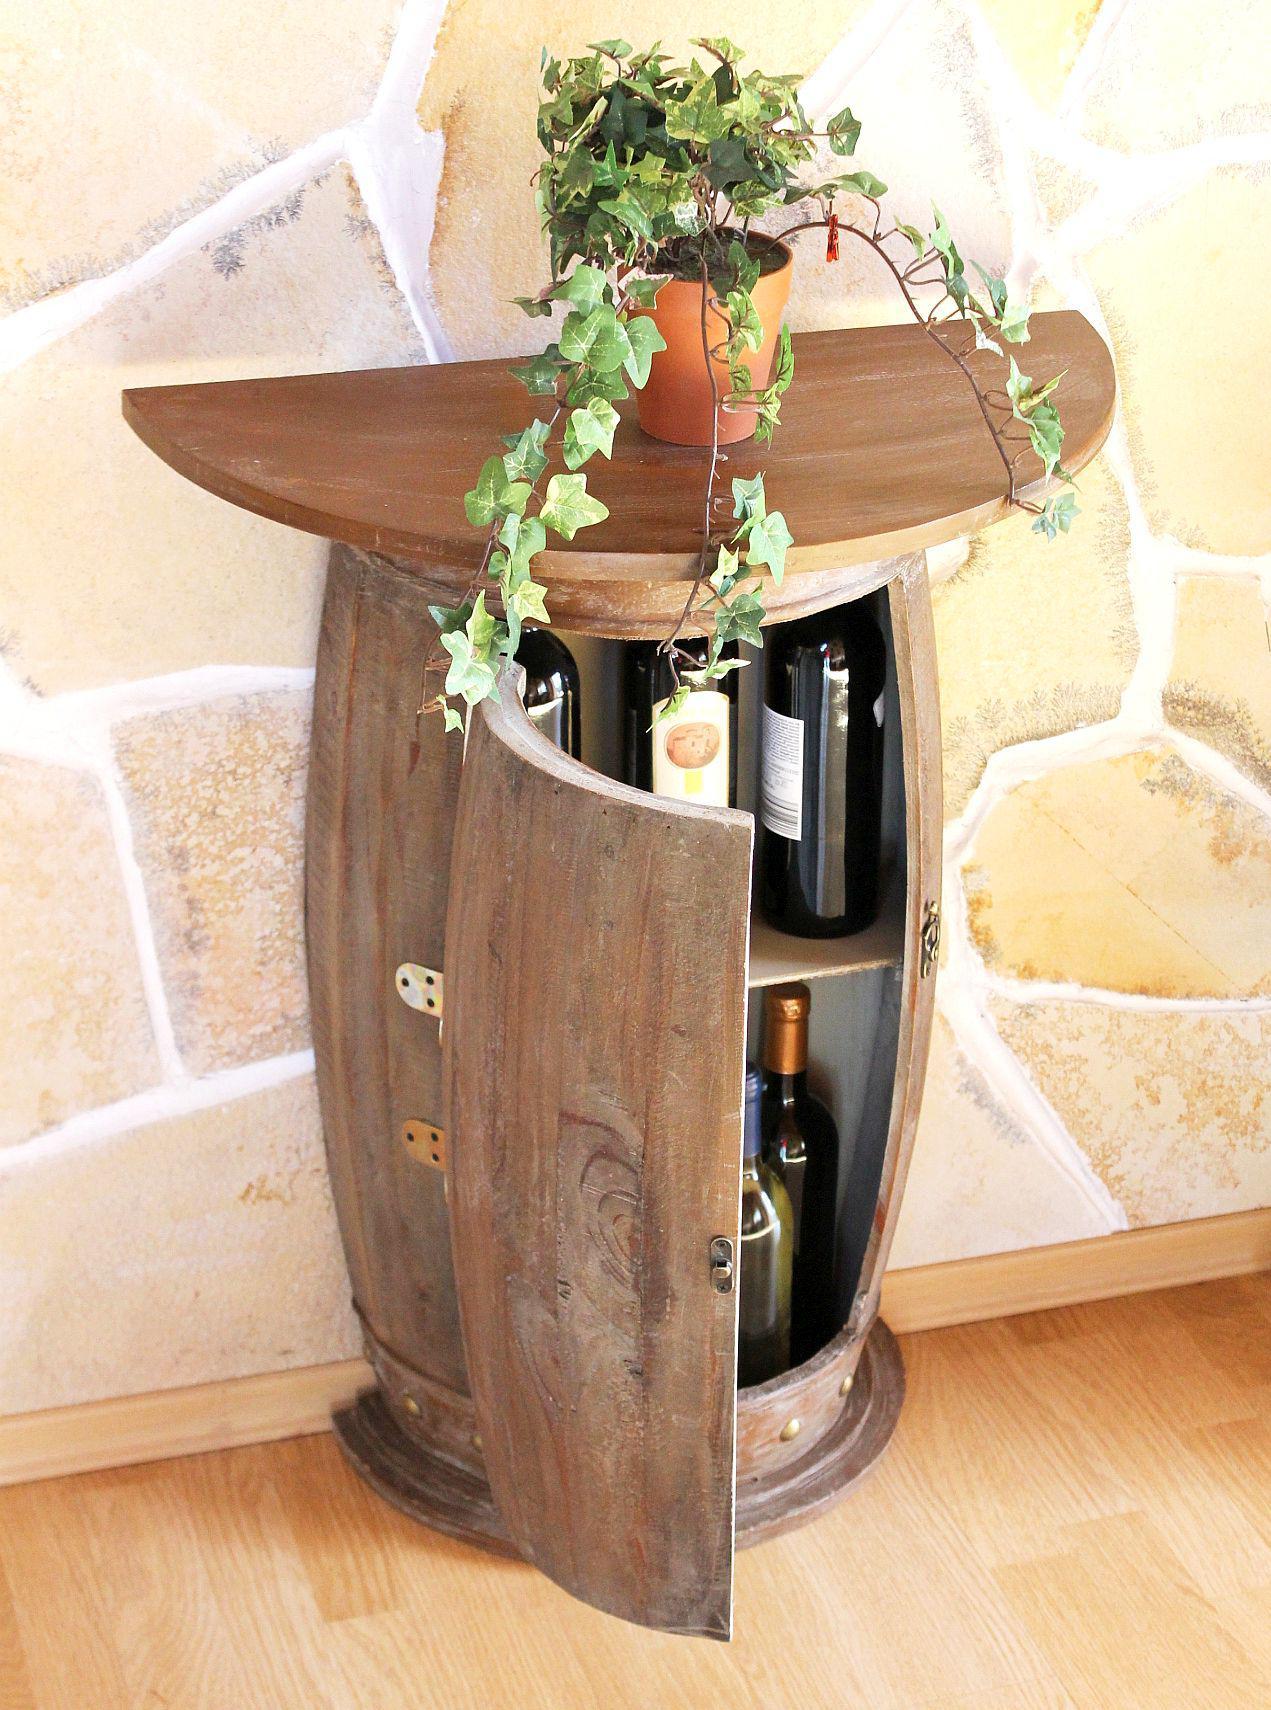 Dom I Meble Wandtisch Tisch Weinfass 0373 Schrank Weinregal Fass Aus Holz 73 Cm Akcesoria Do Wina I Barowe A2btravel Ge